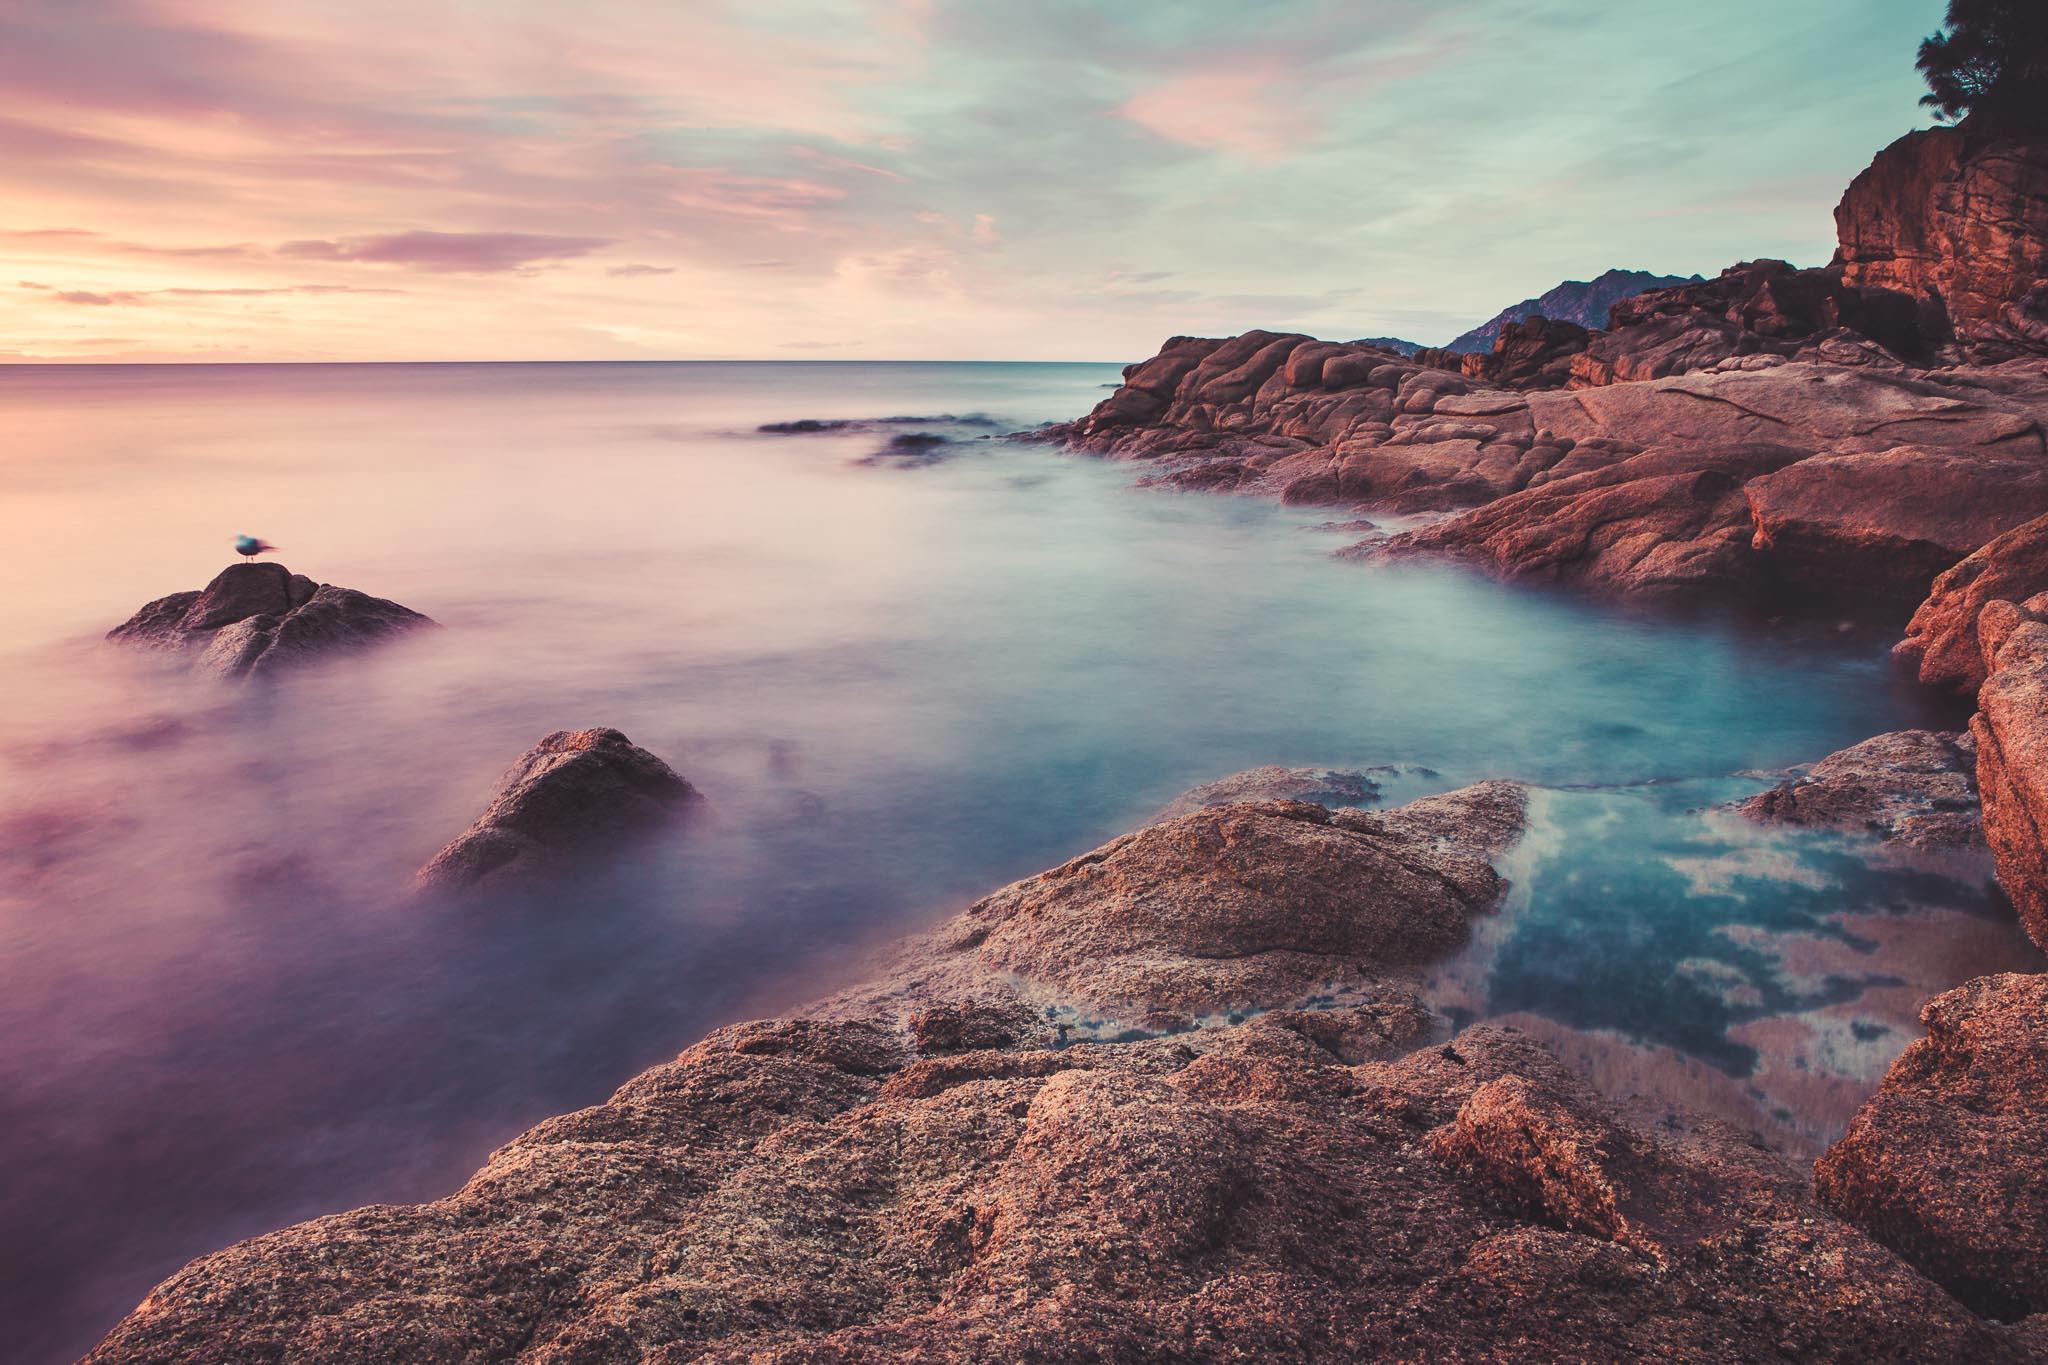 Sleepy Bay, Freycinet National Park